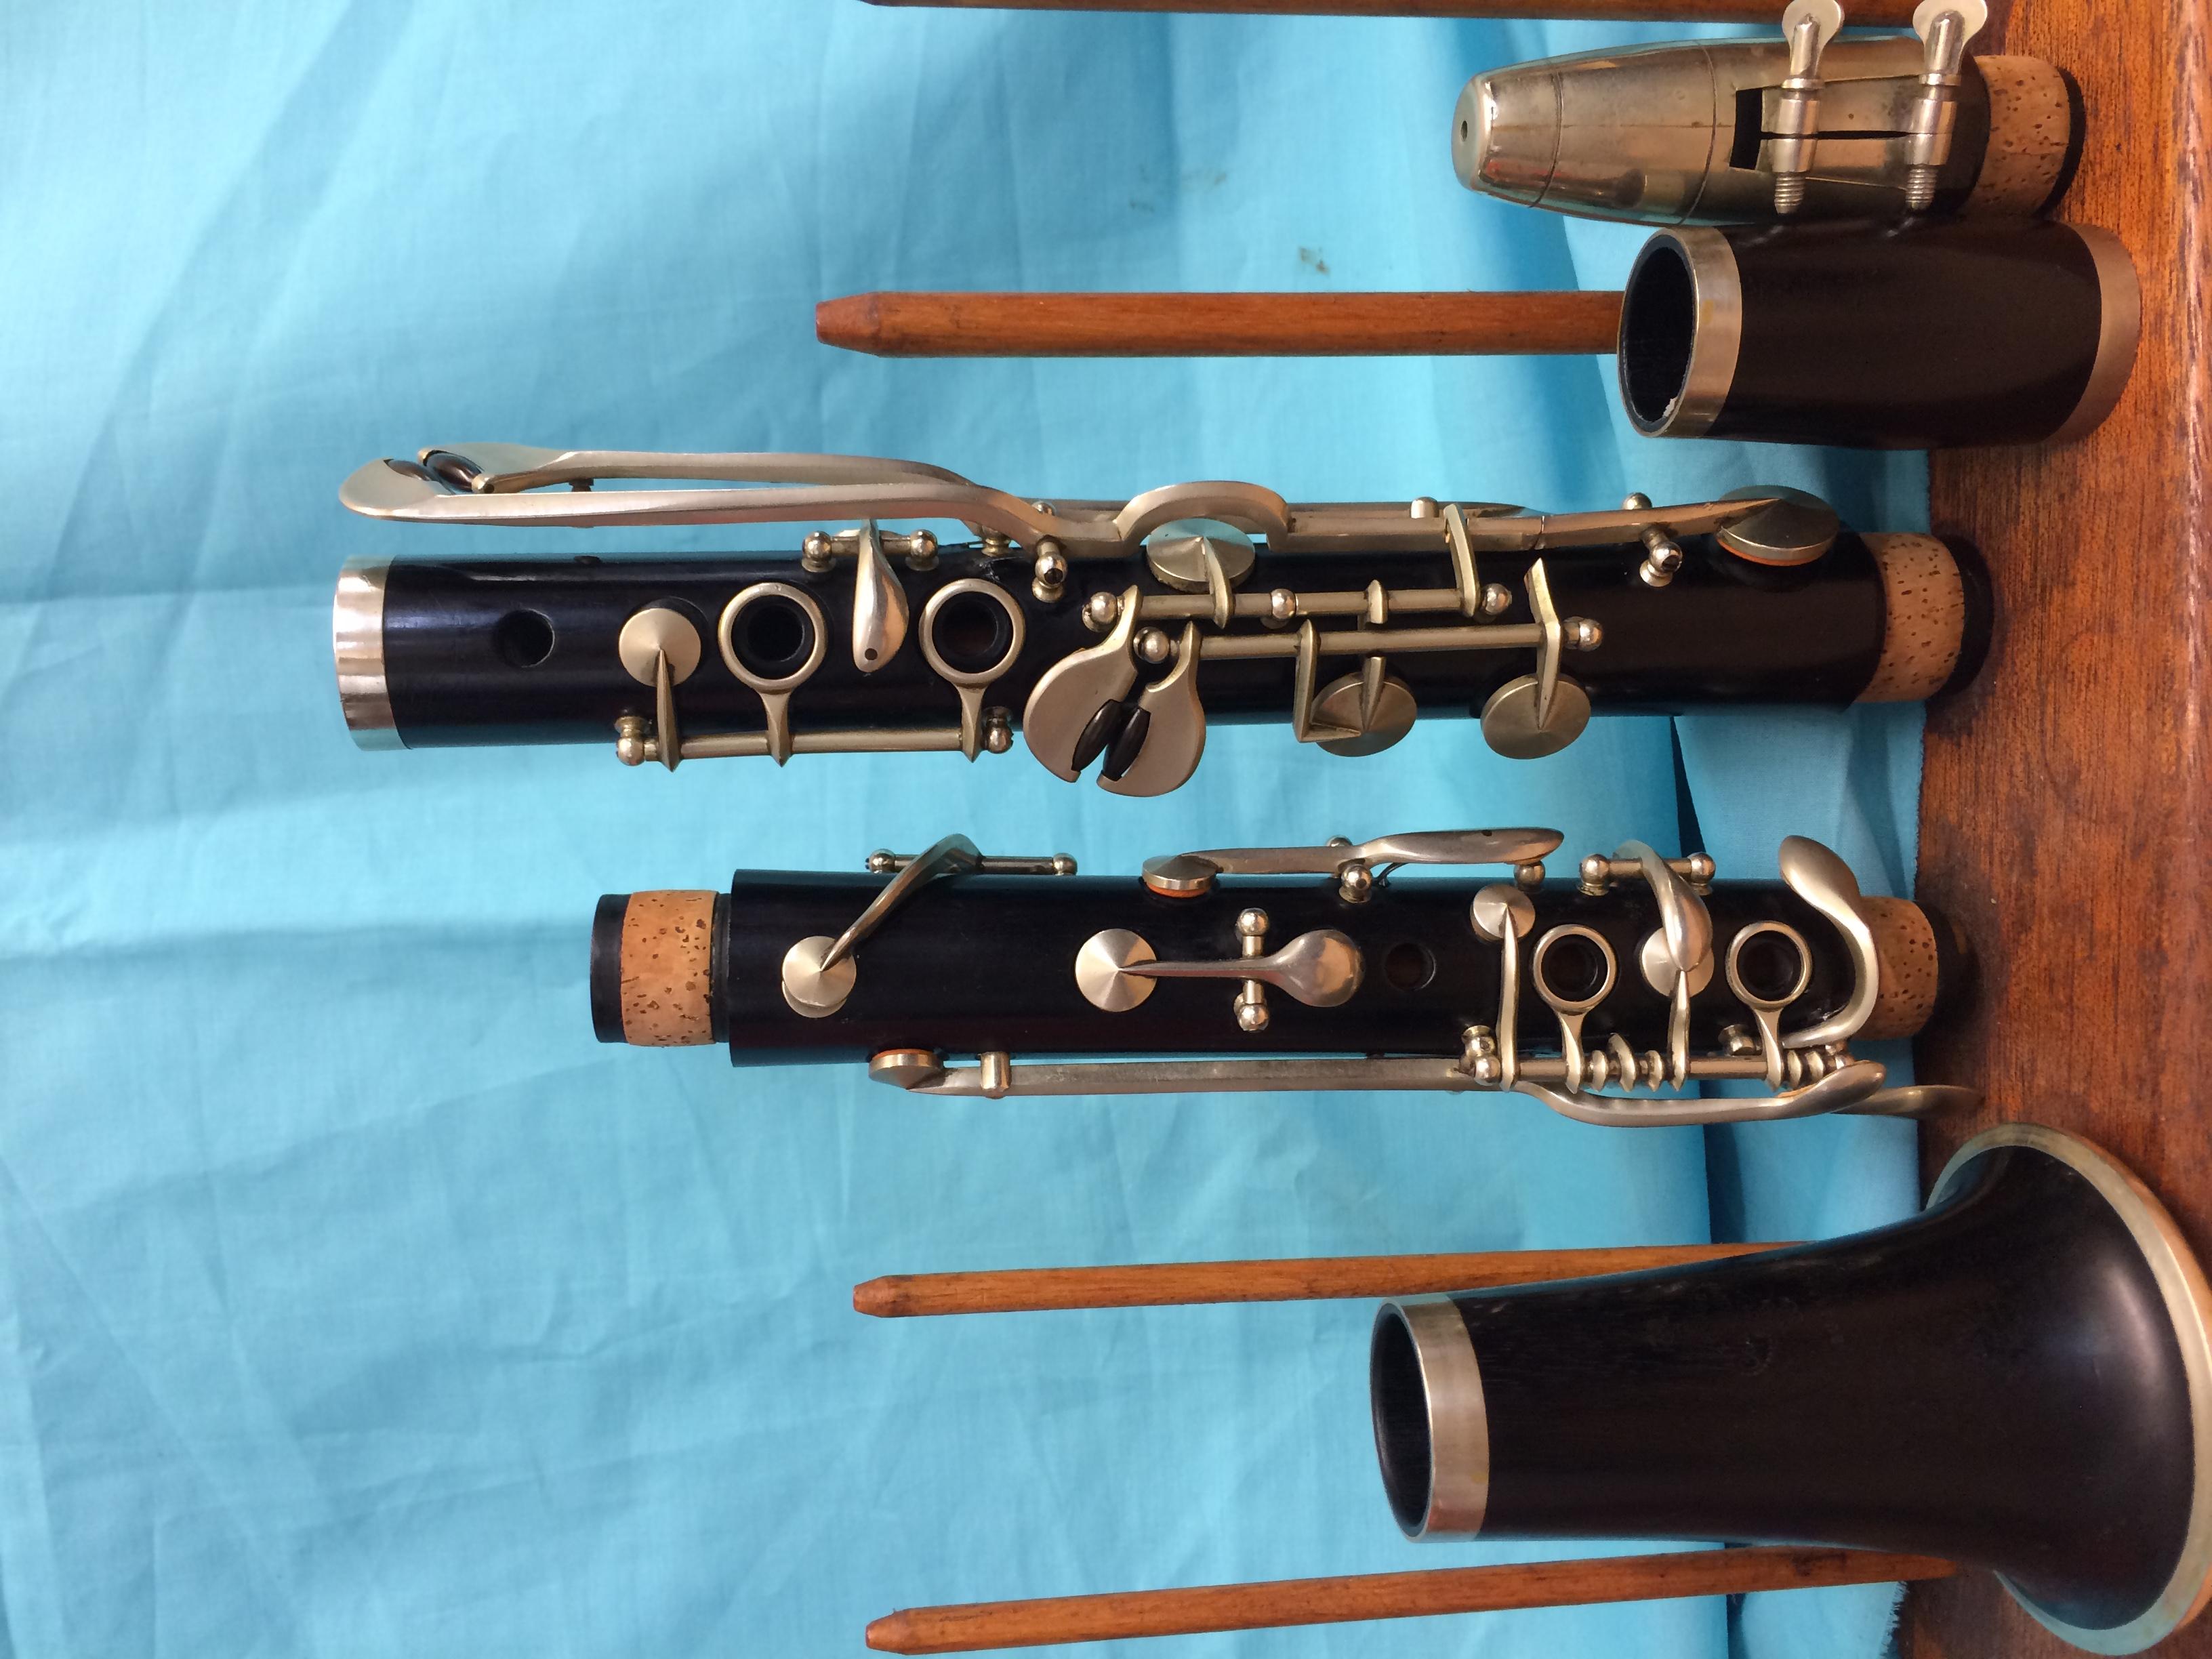 Albert System Clarinet